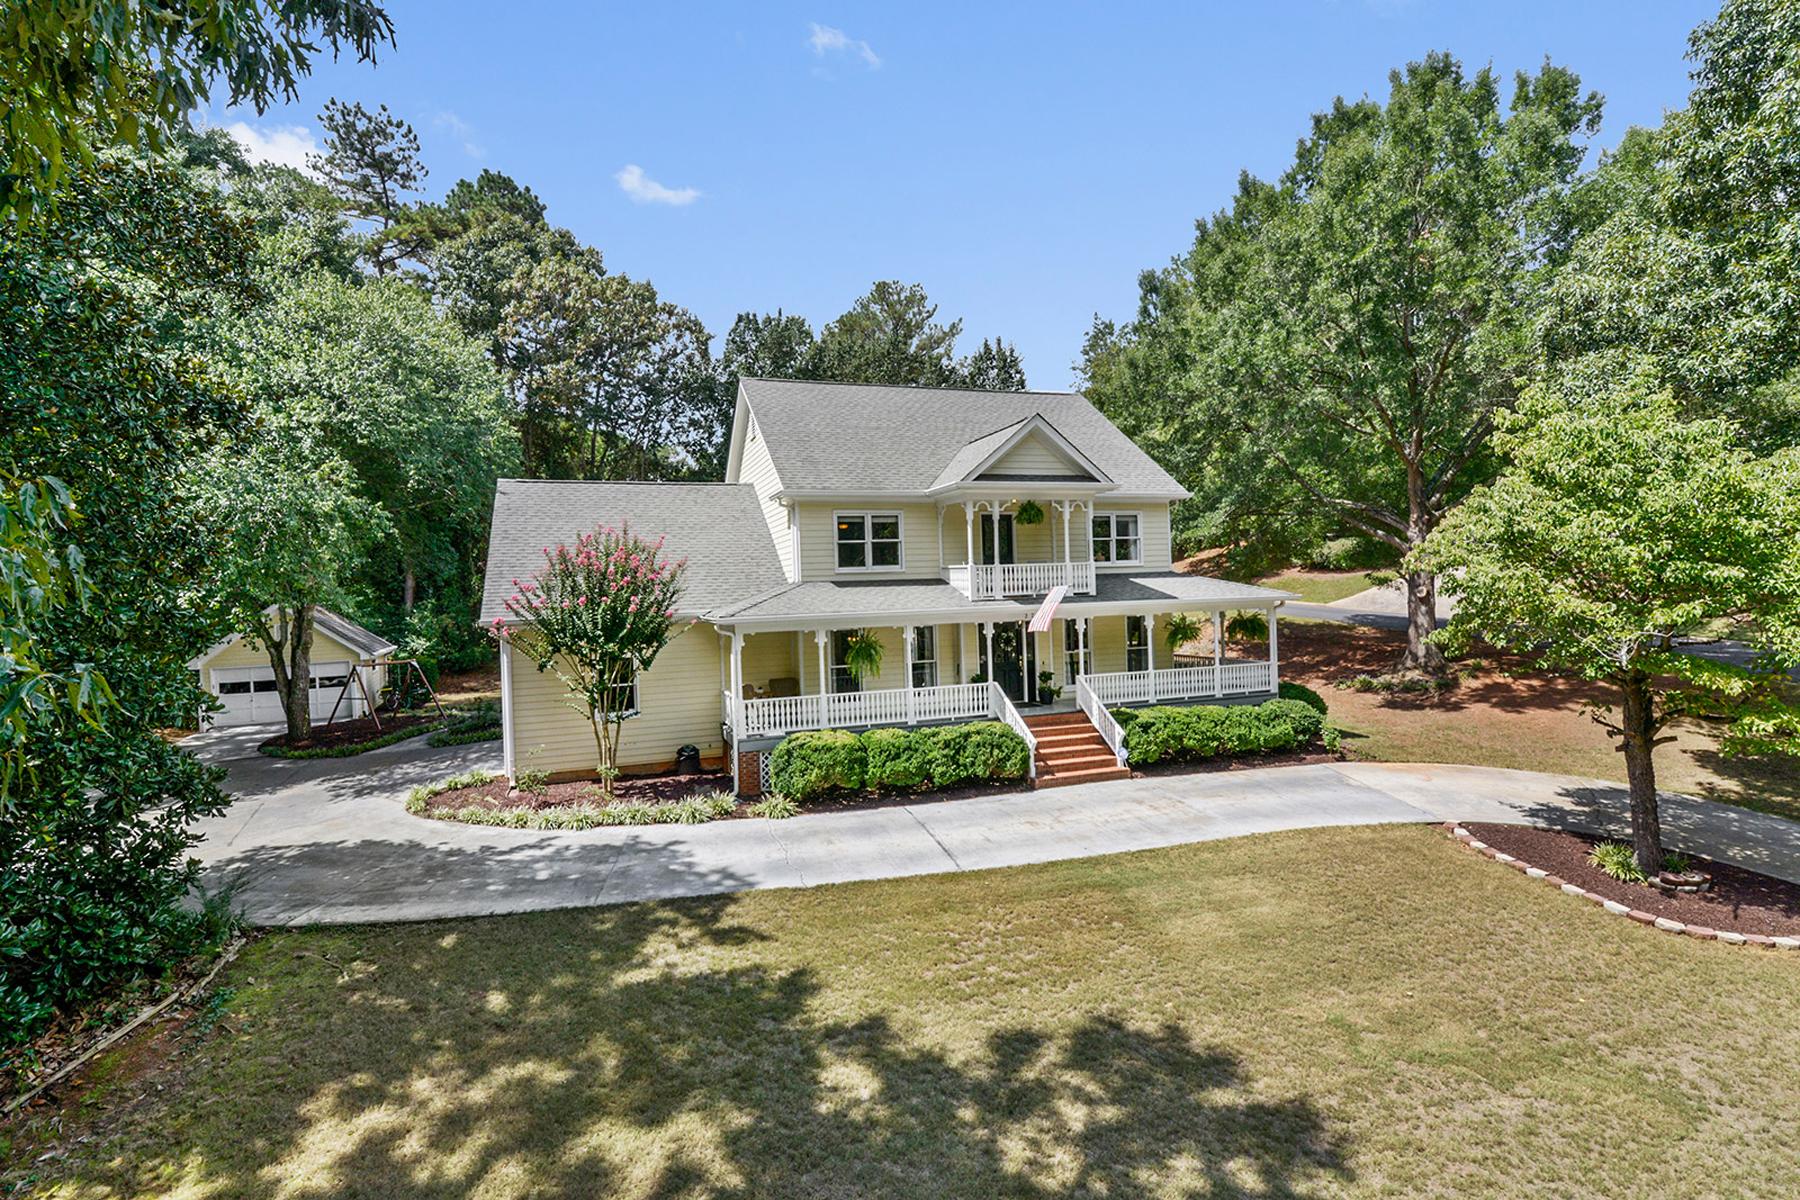 獨棟家庭住宅 為 出售 在 Traditional Victorian Farmhouse 2721 Harvest Drive SE Conyers, 喬治亞州, 30013 美國